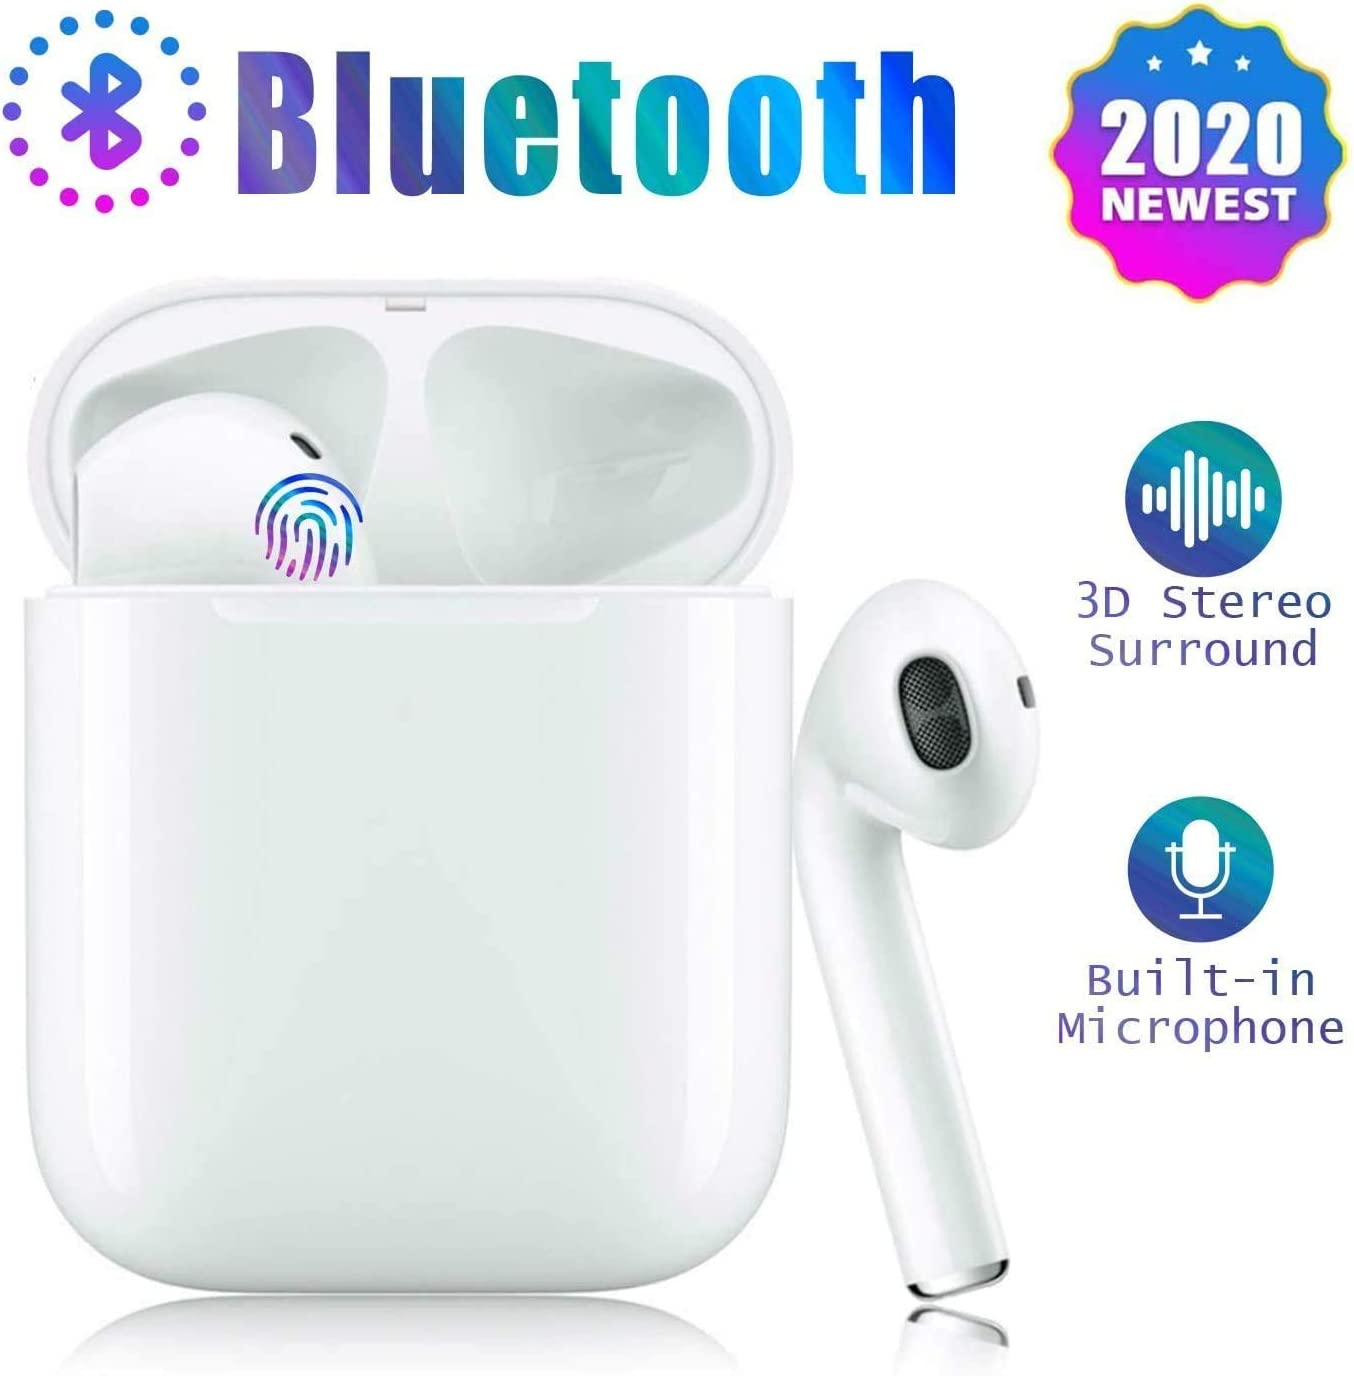 Auriculares inalámbricos,Auriculares Bluetooth 5.0,Bluetooth Deporte con Micrófono Reducción de Ruido CVC 8.0 Cascos,Auriculares Inalambricos Bluetooth para Apple AirPods iPhone/Samsung/Android